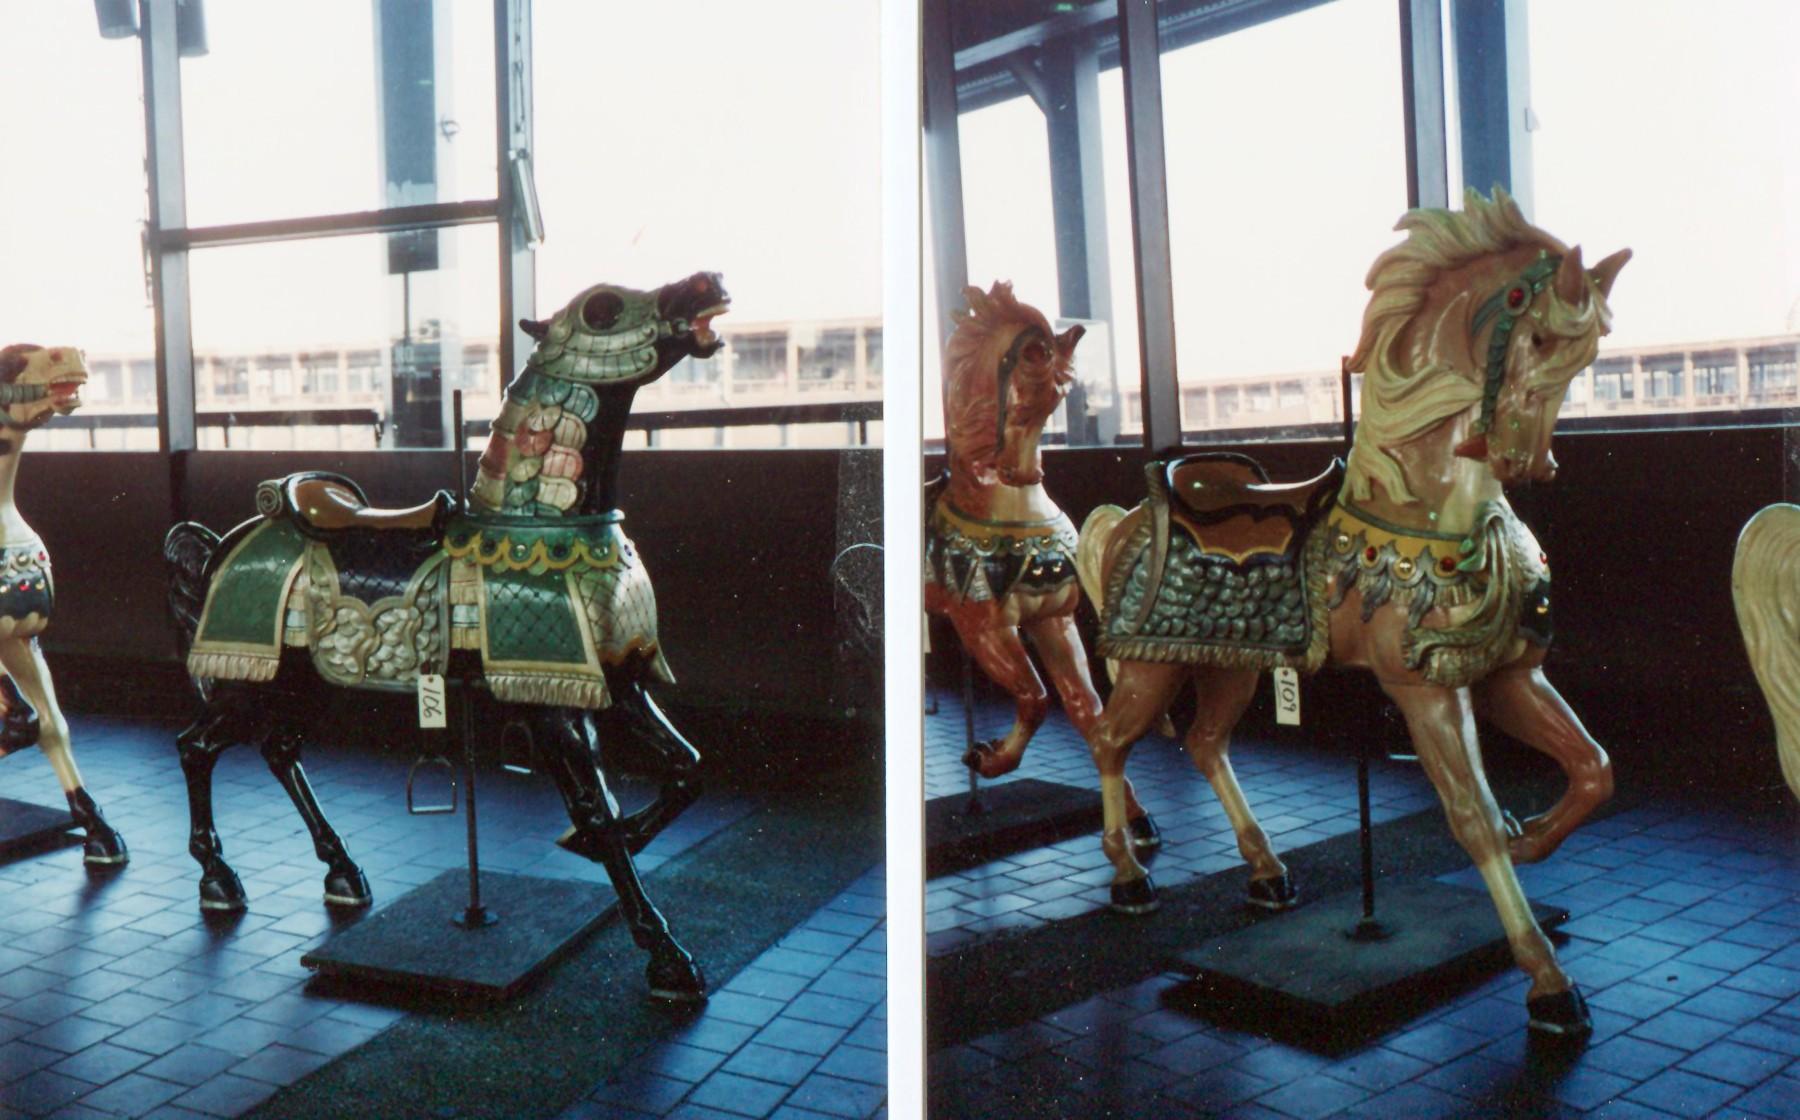 Eldridge-Park-Elmira-Carmel-carousel-horses-Guernsey-auction-1989